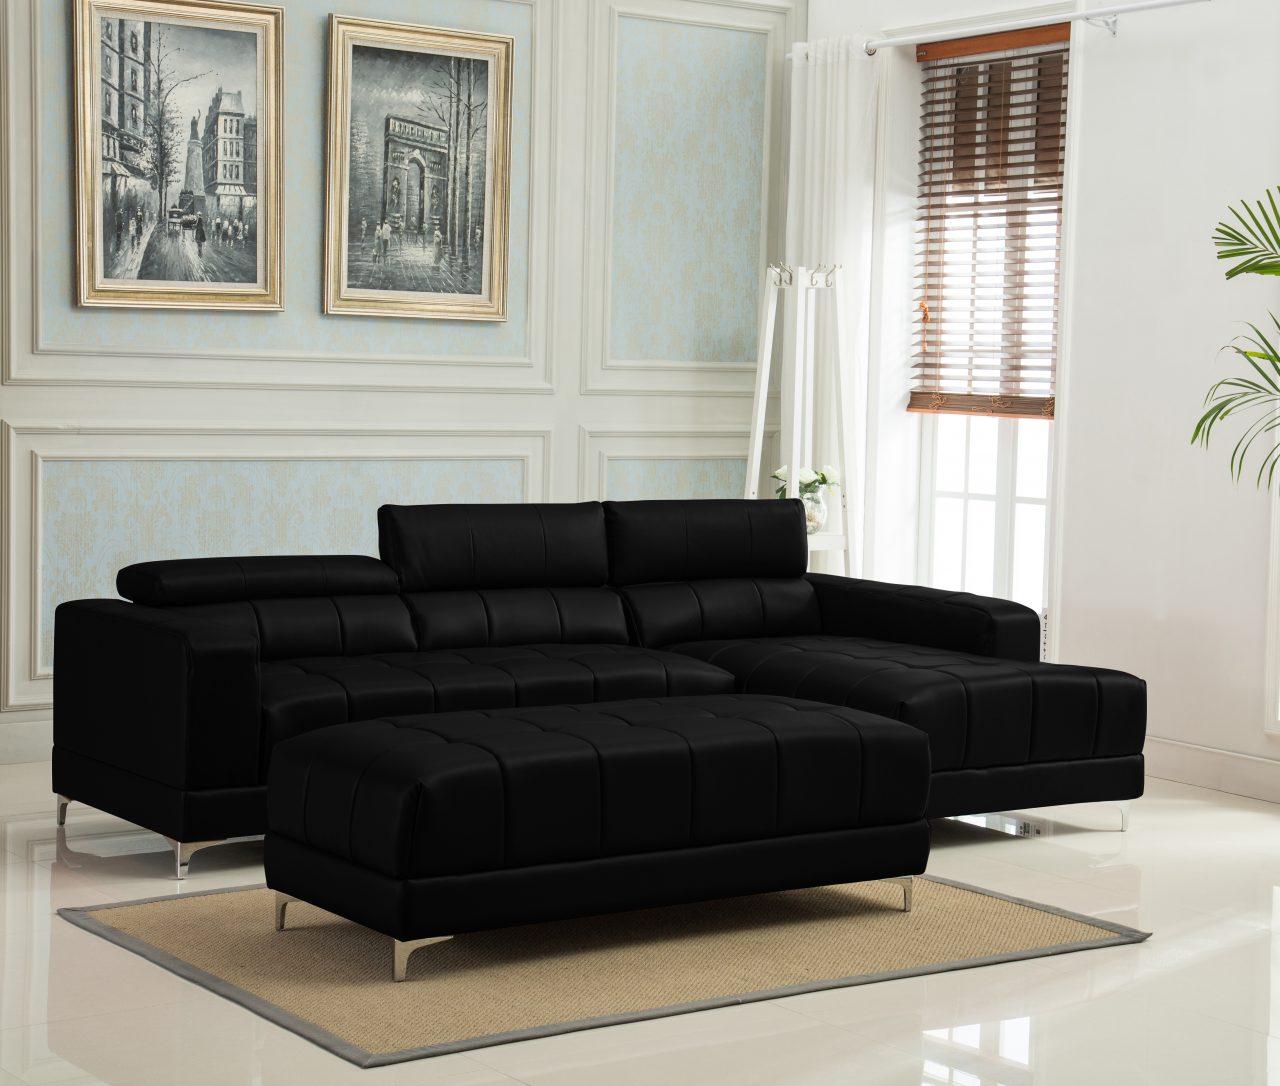 Marbella Sectional Sofa & Ottoman Set